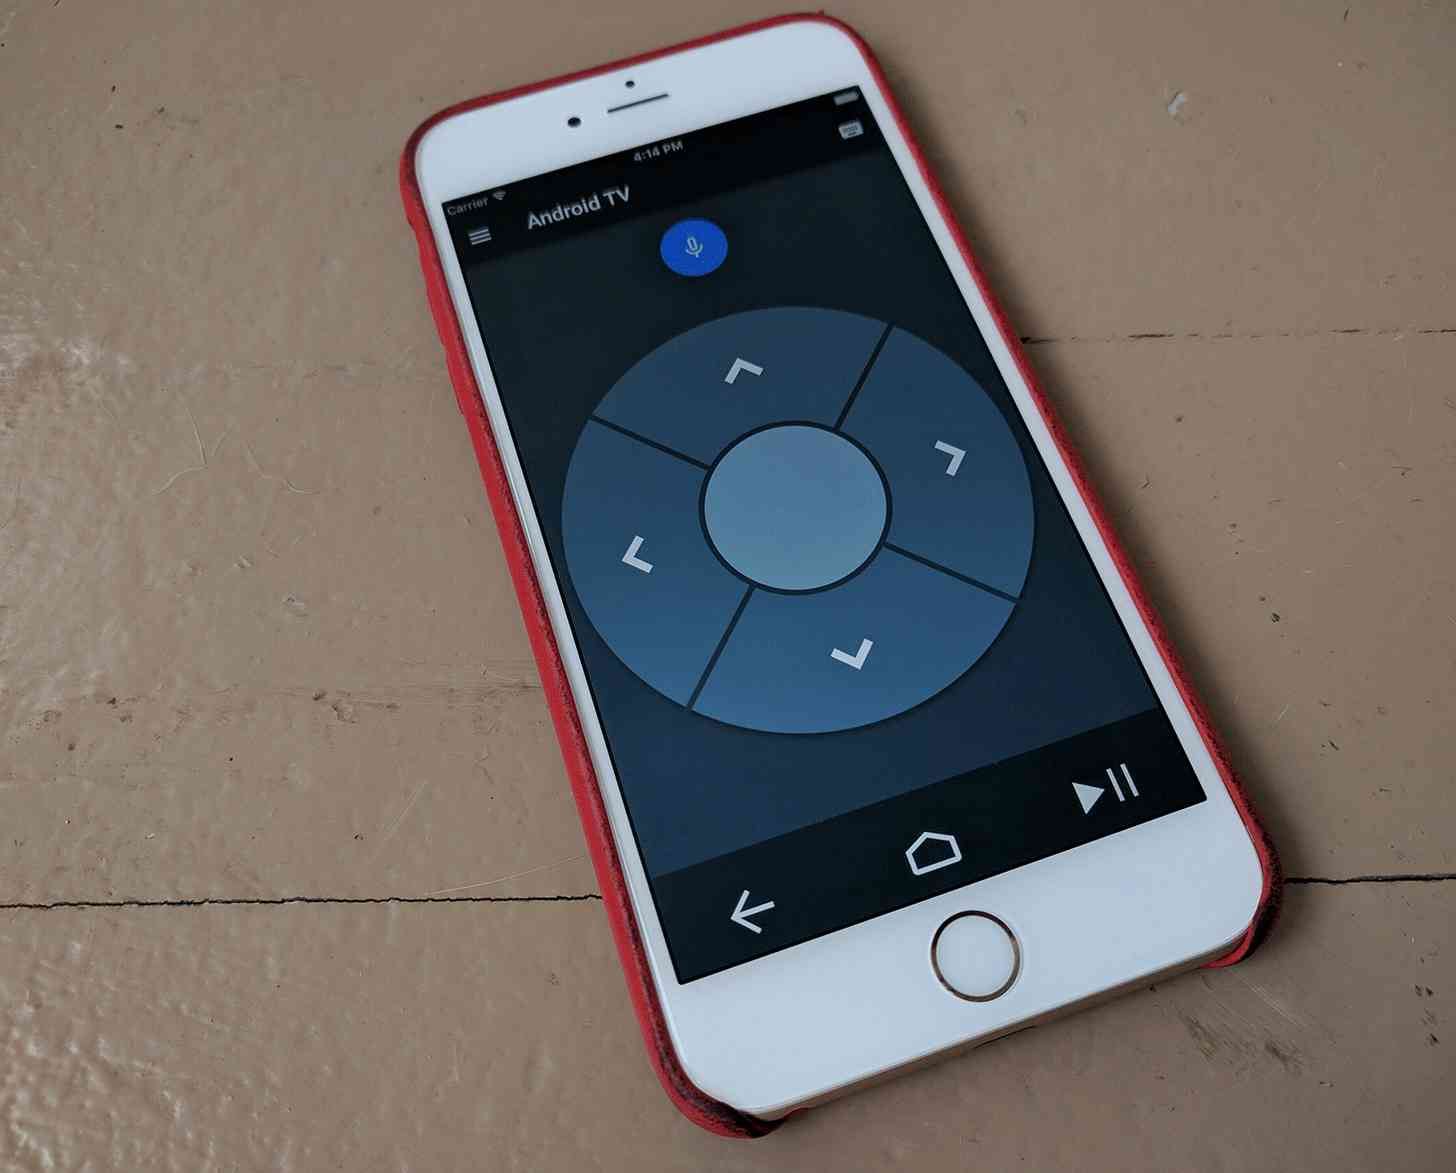 Android TV remote iOS app